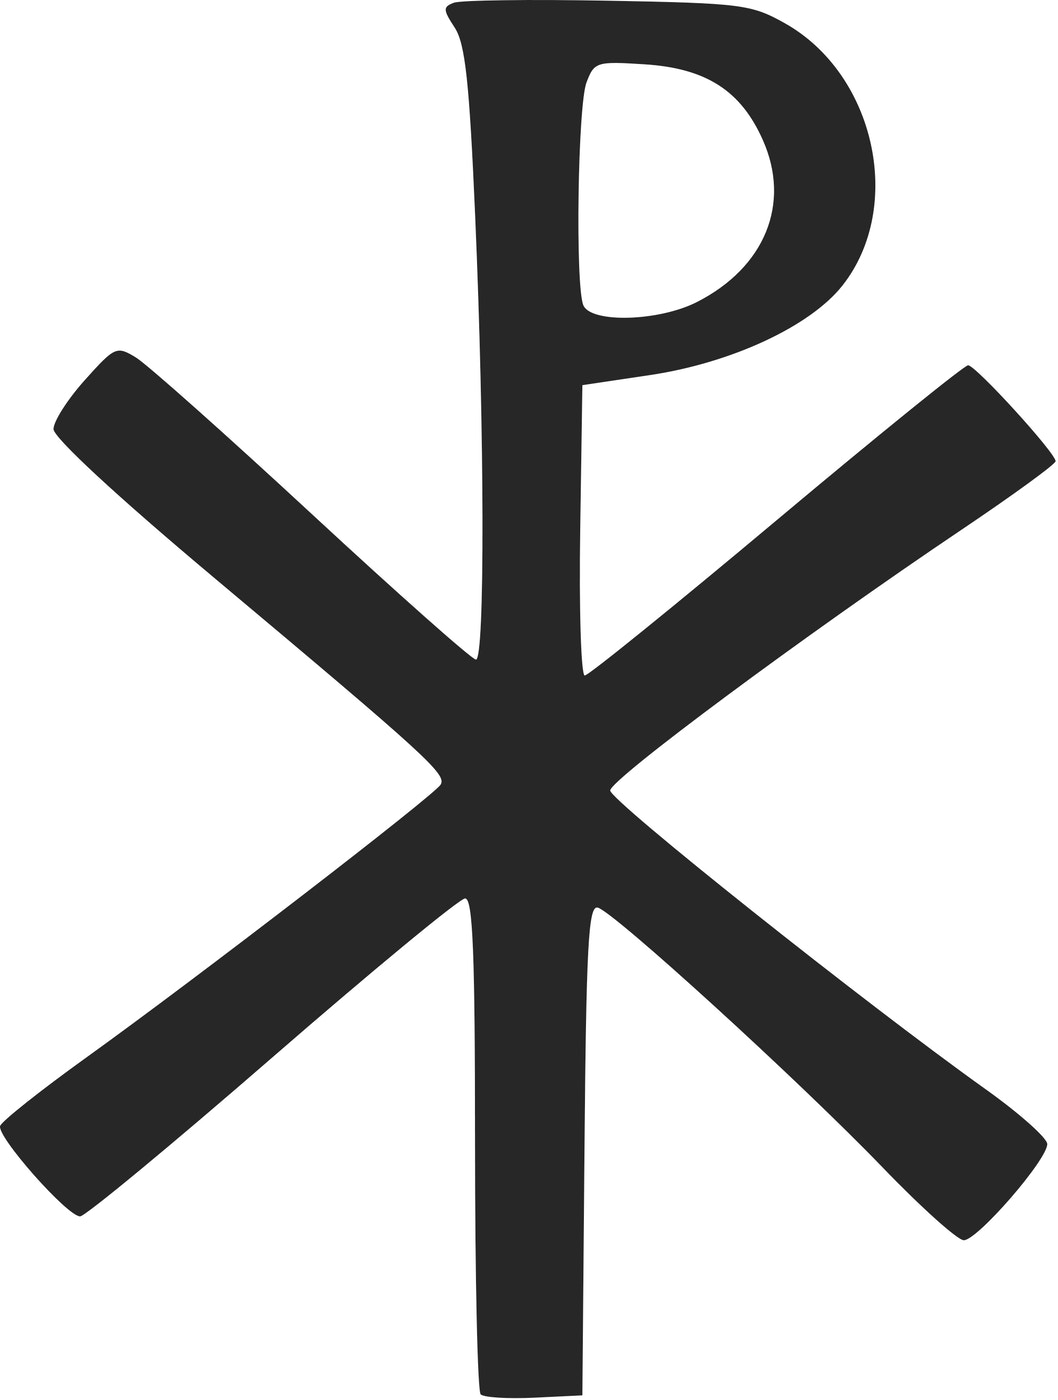 Chi rho religionfacts chi rho symbol buycottarizona Image collections